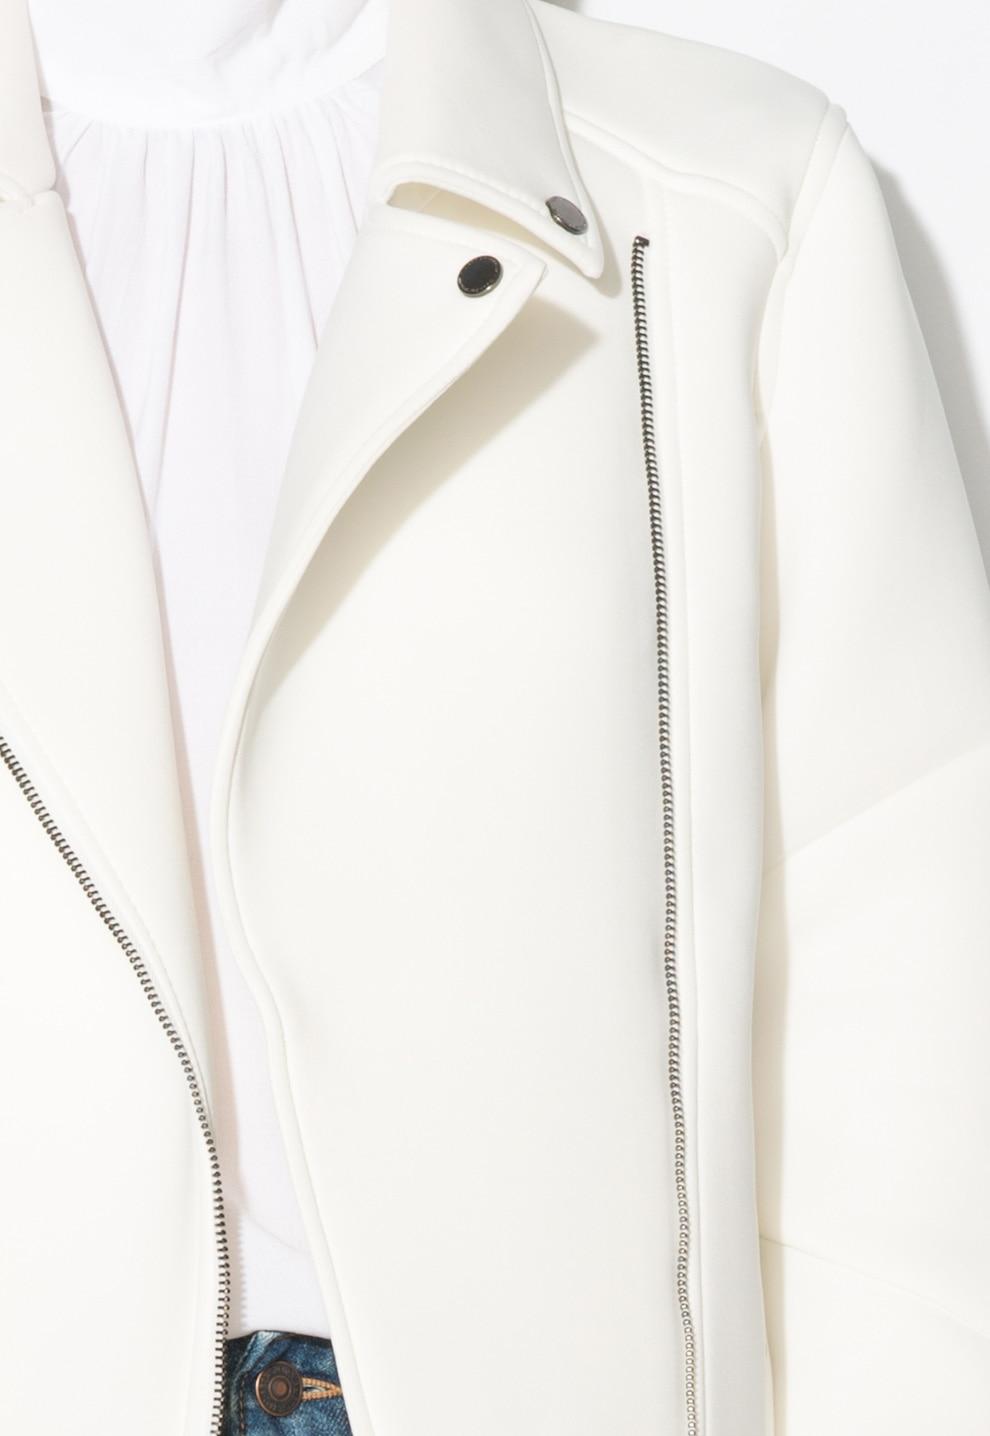 Mexx női kabát, neoprén, vaj fehér, 36 EU eMAG.hu